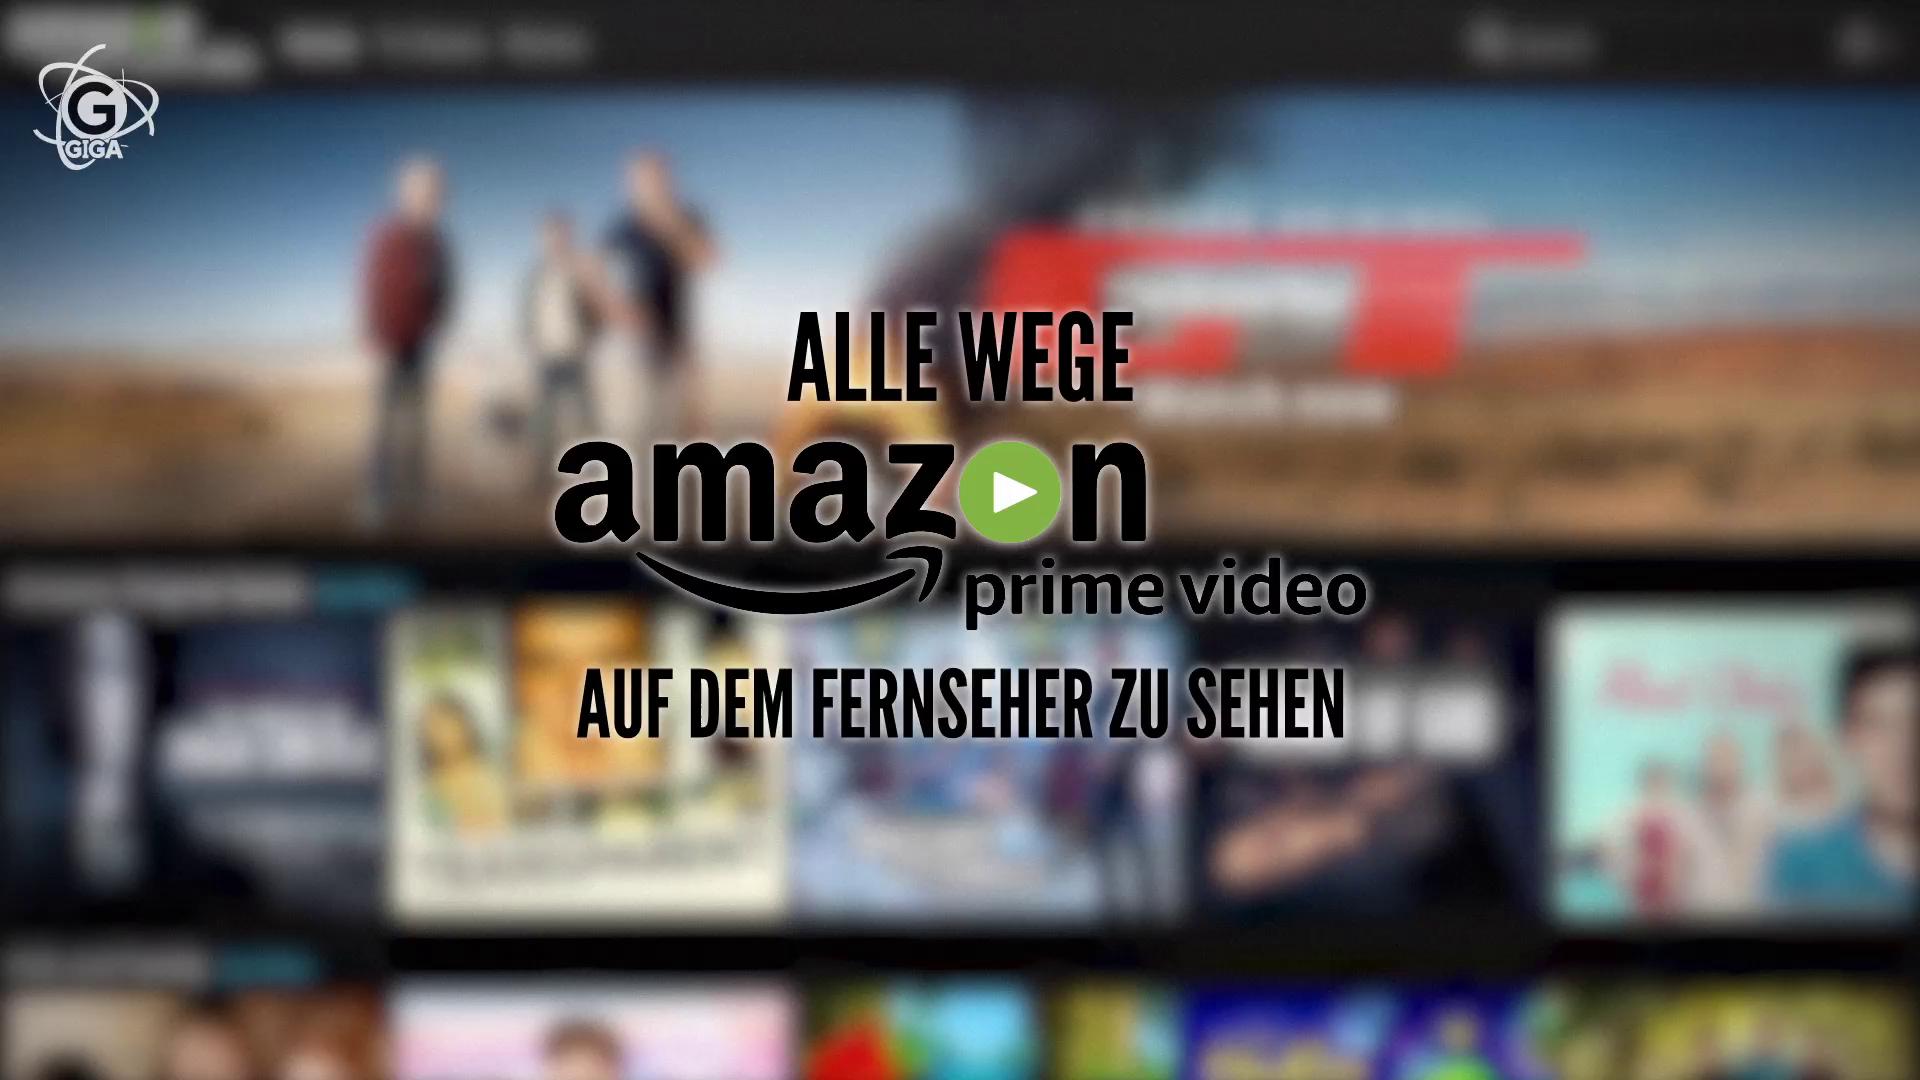 amazon.de/mytv code eingeben